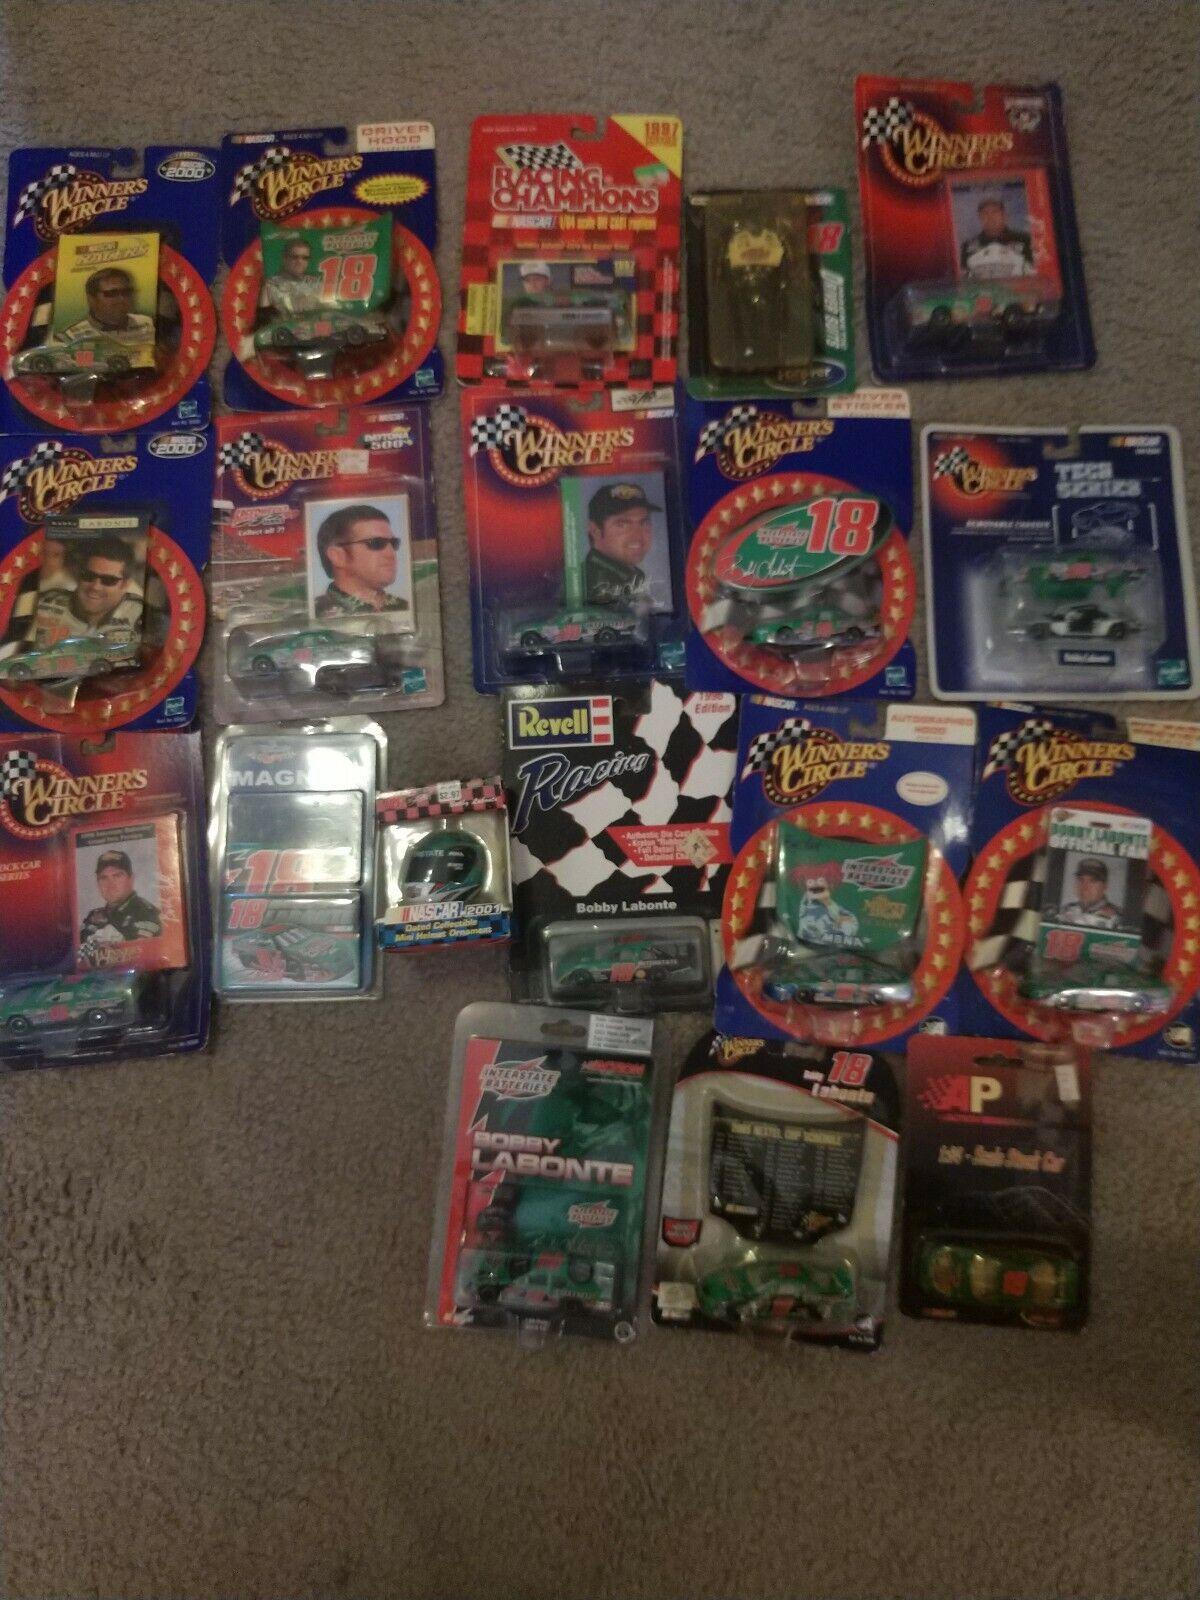 Bobby Labonte Nascar Diecast Car Collection 1 64, 16 cars and 3 bonus items